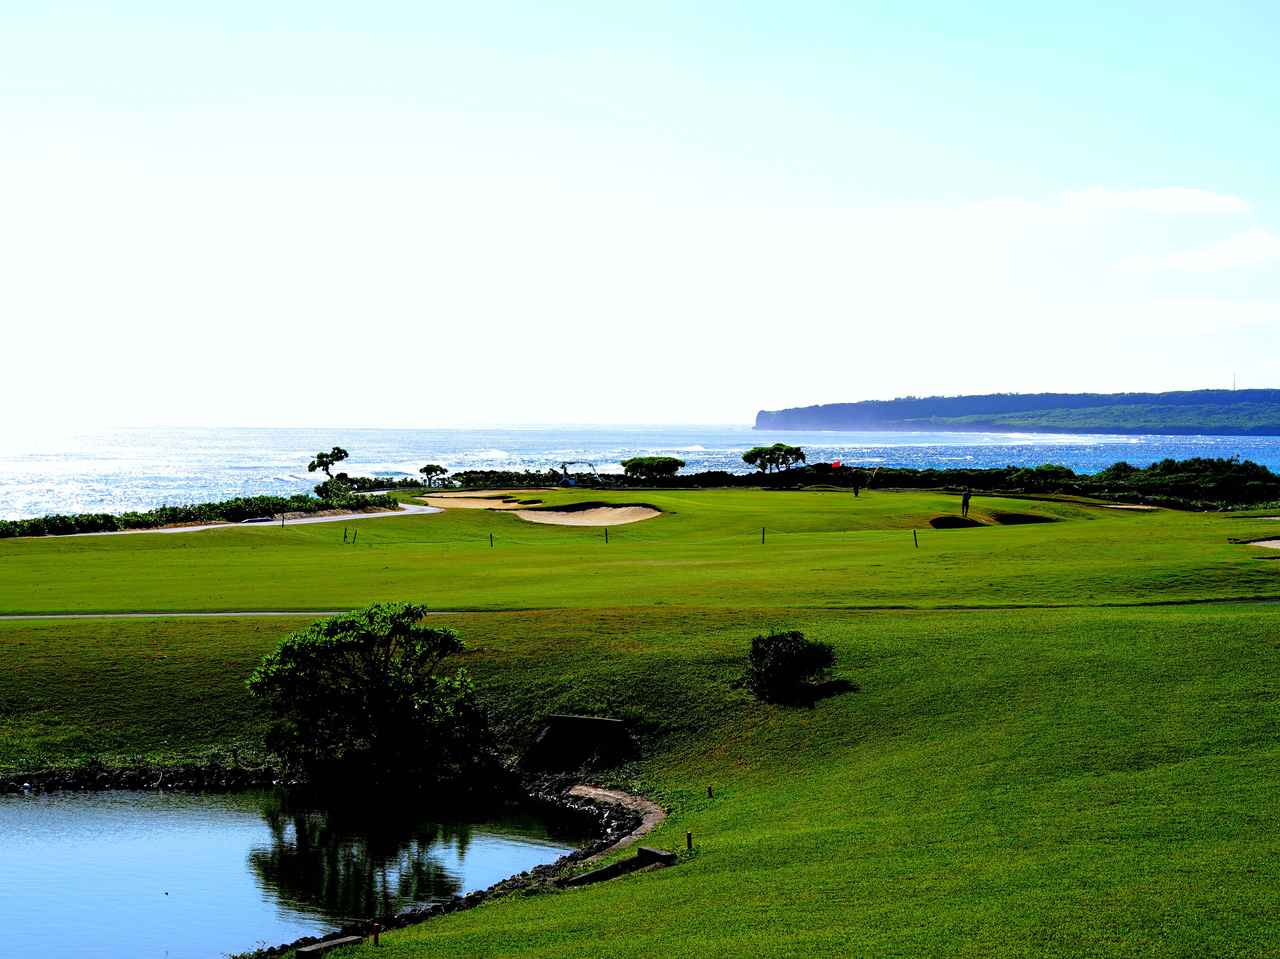 Images : 4番目の画像 - エメラルドコーストゴルフリンクス - ゴルフへ行こうWEB by ゴルフダイジェスト